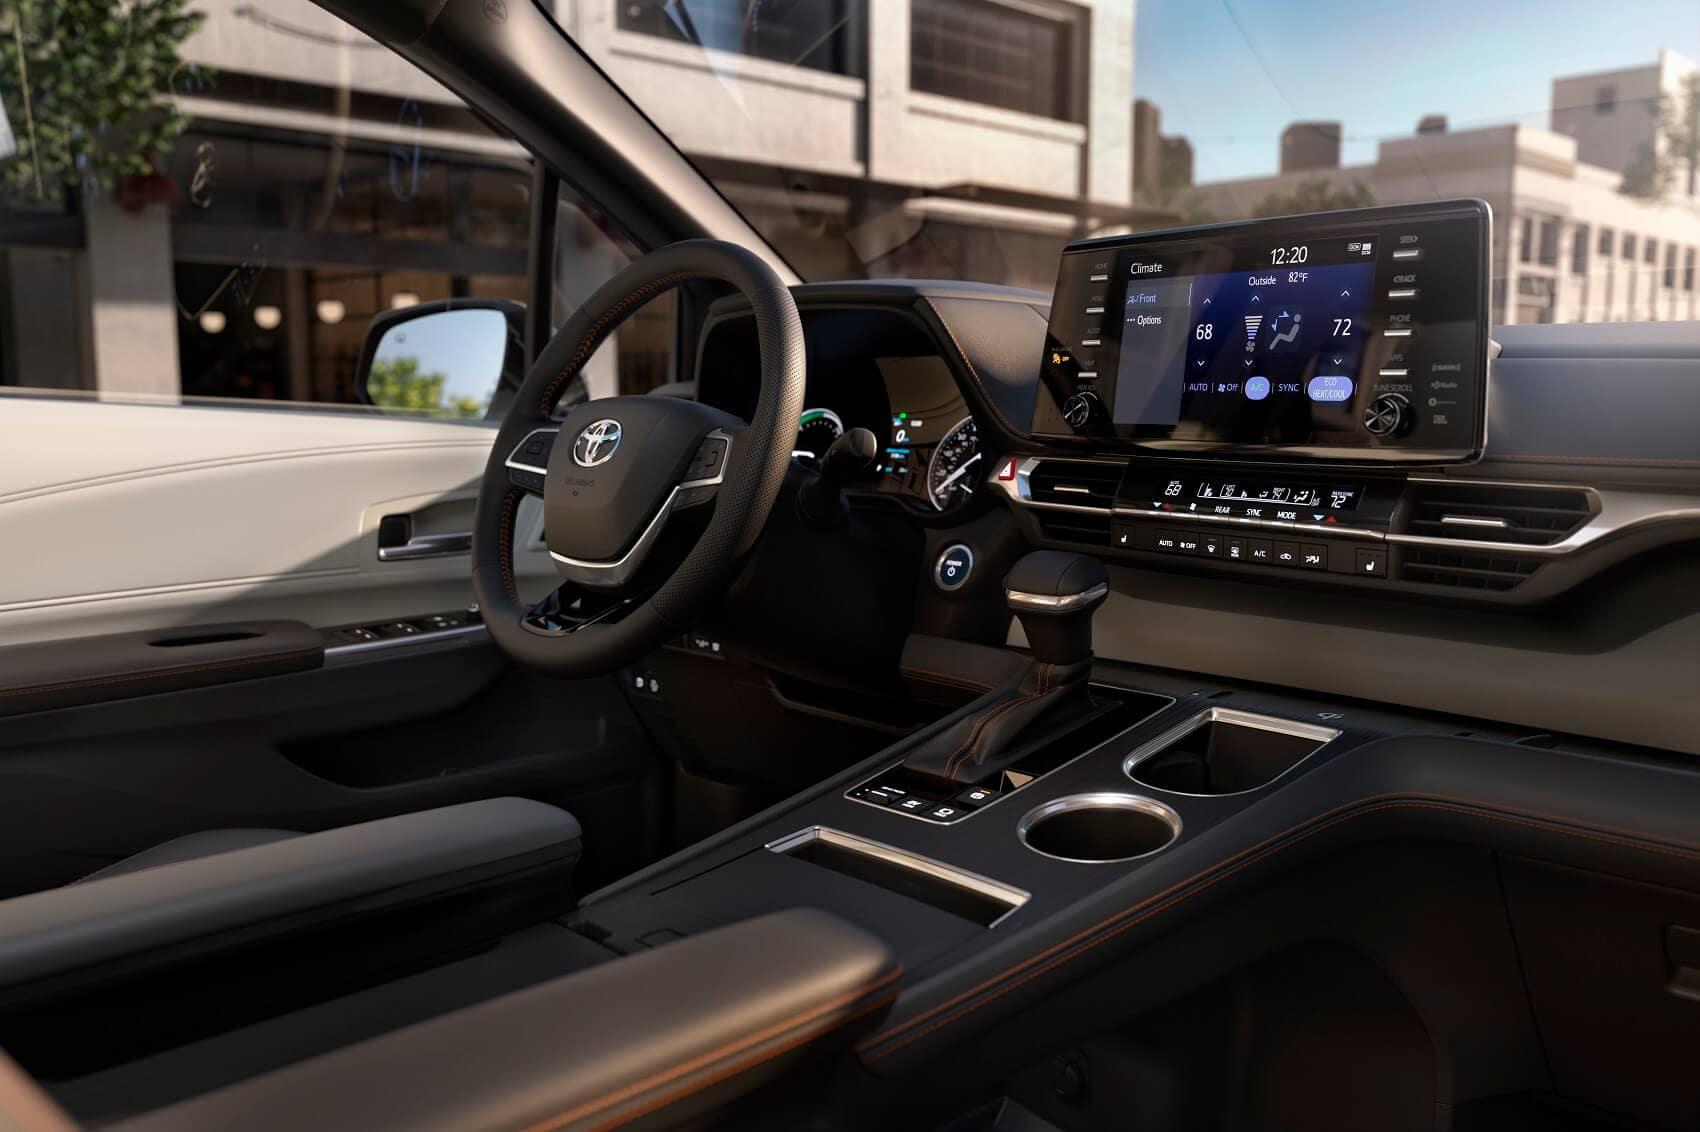 Toyota Sienna Interior Space & Amenities